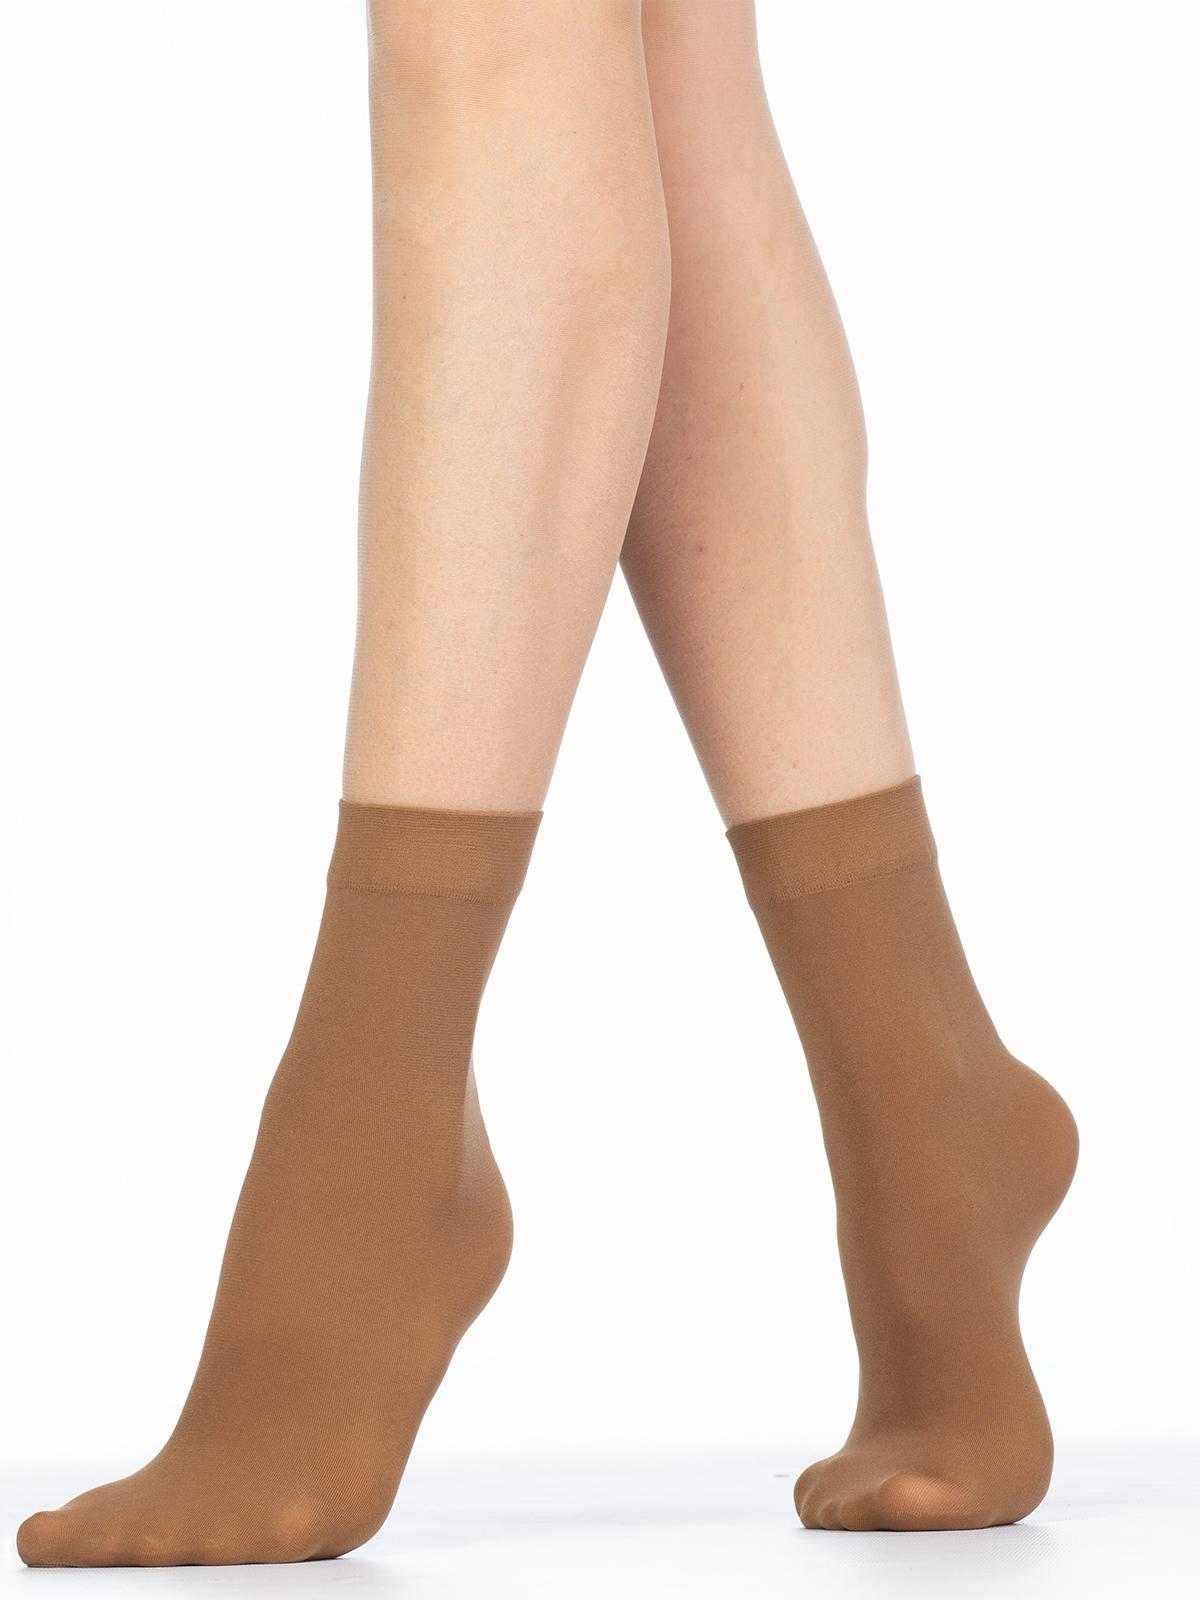 Капроновые носки женские Giulia BLUES 50 microfibra бежевые UNI